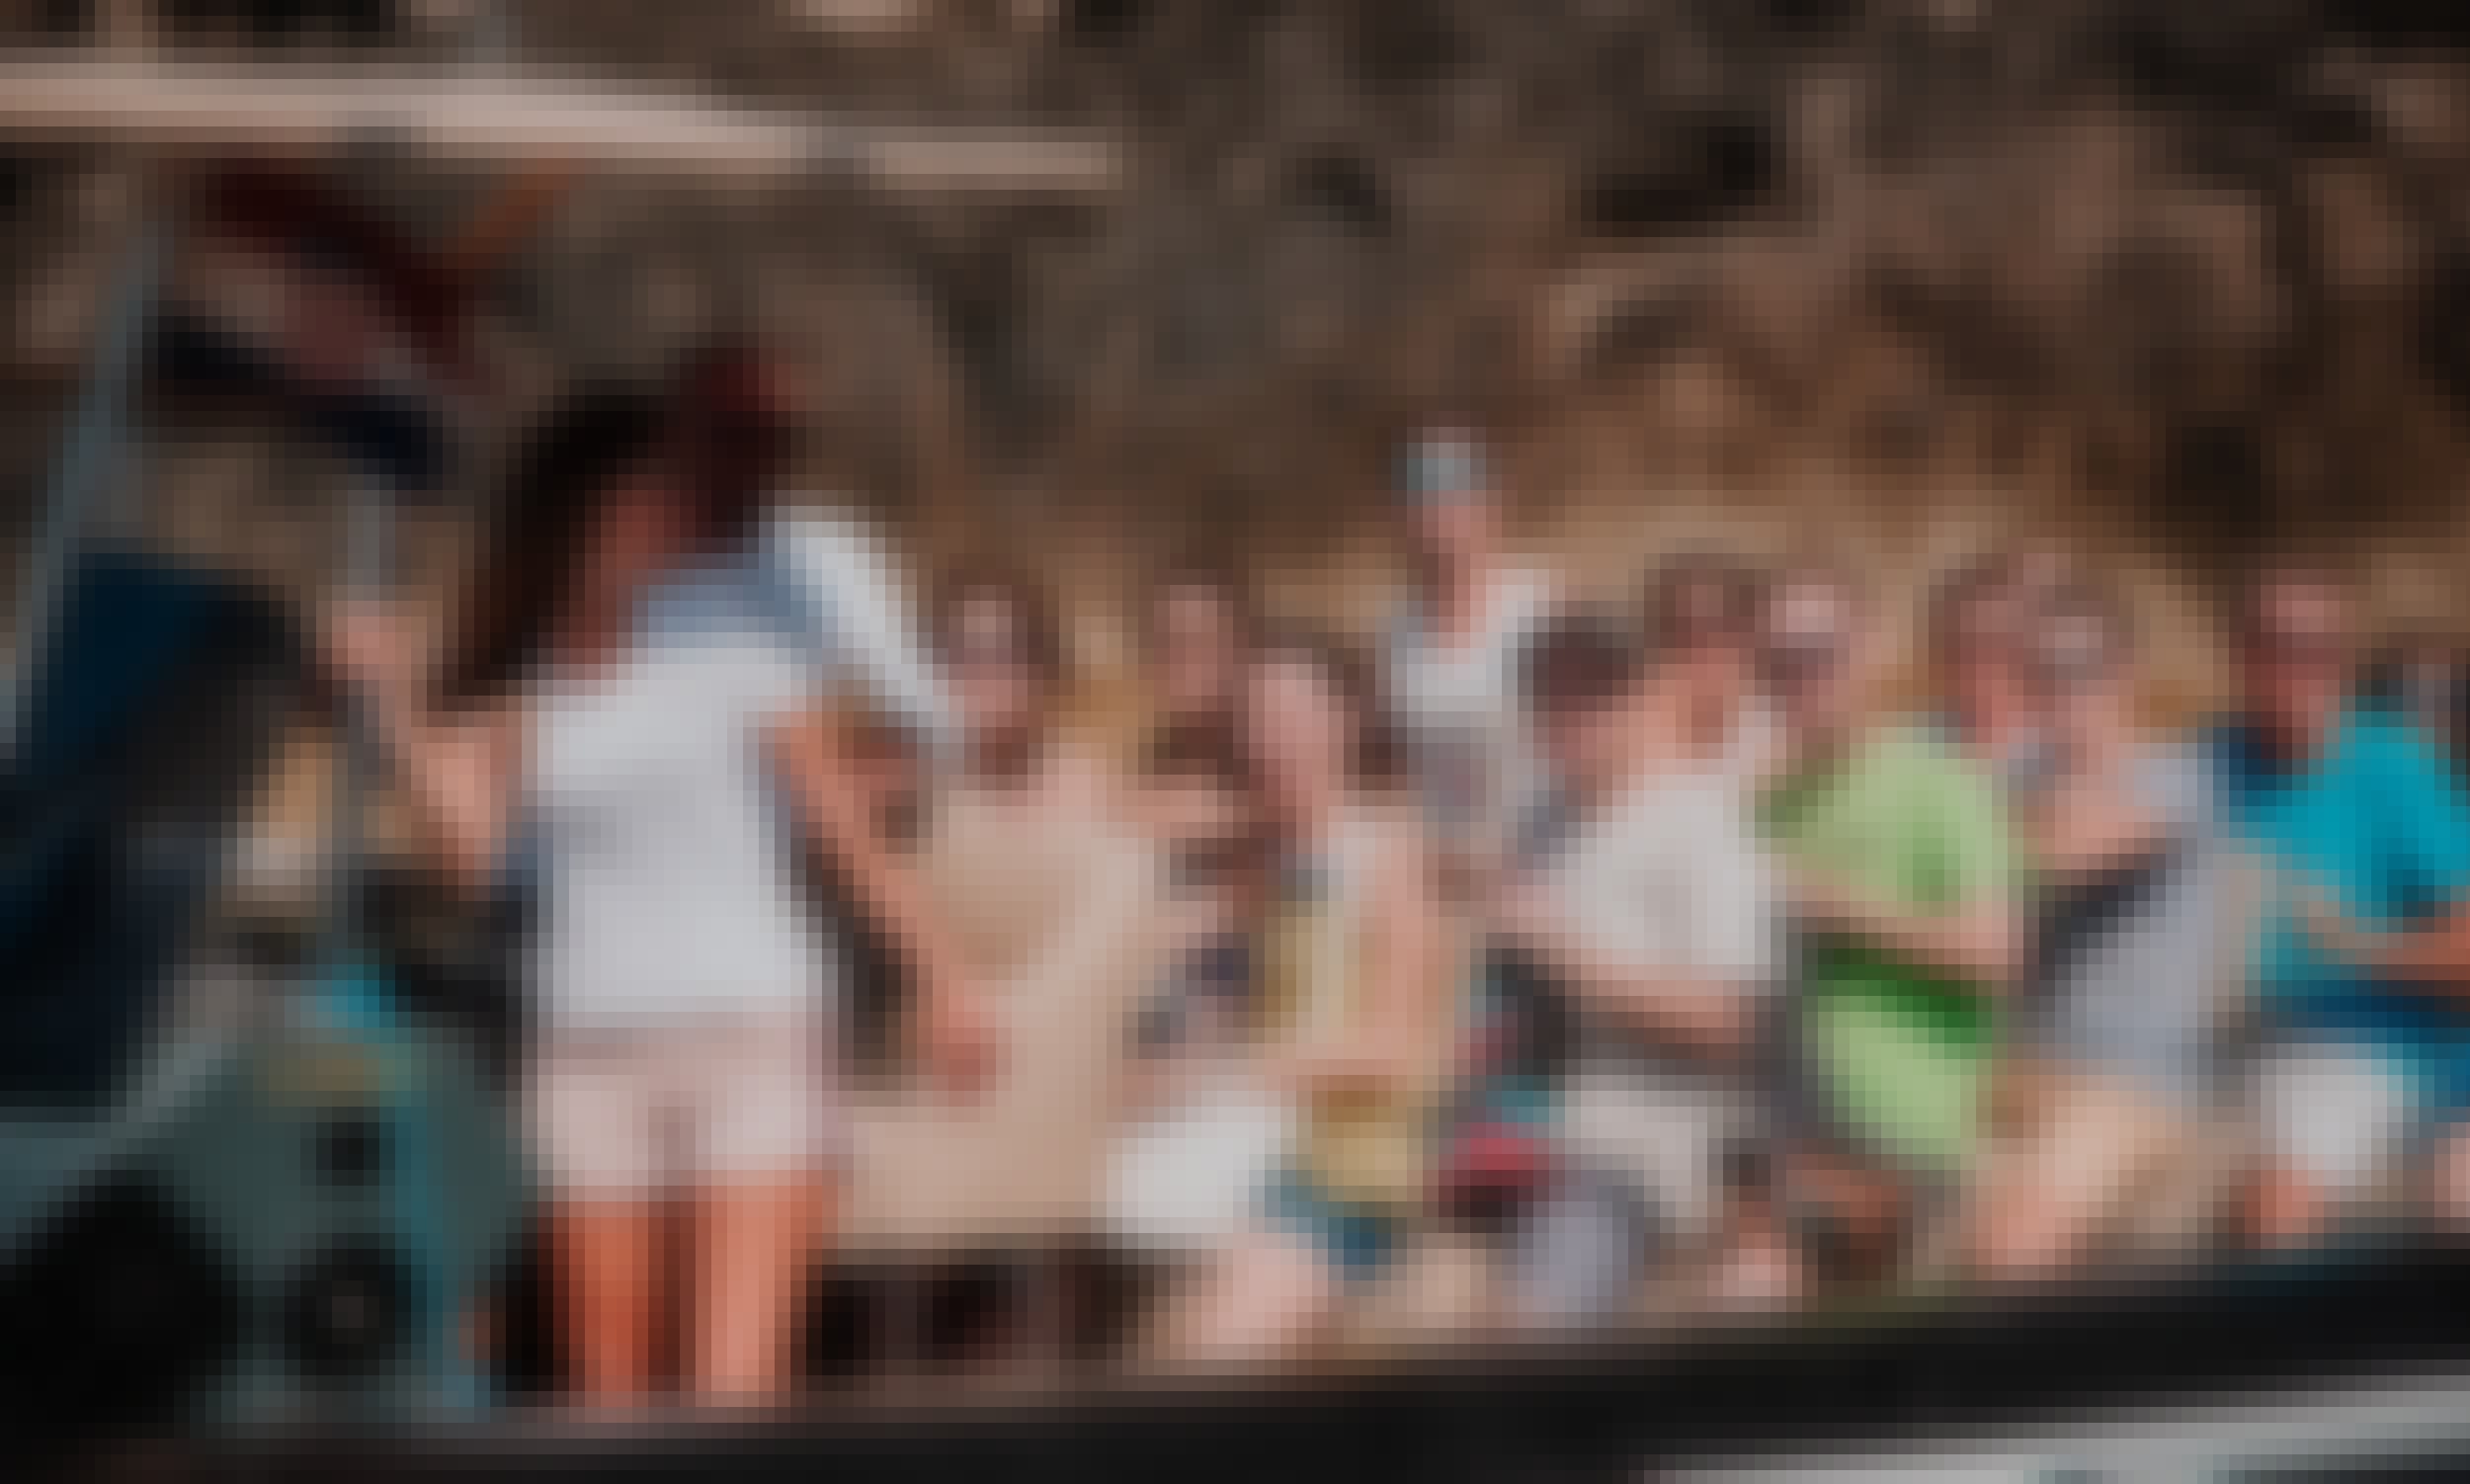 Blue cave & Hvar, 5 islands tour from Trogir, Croatia